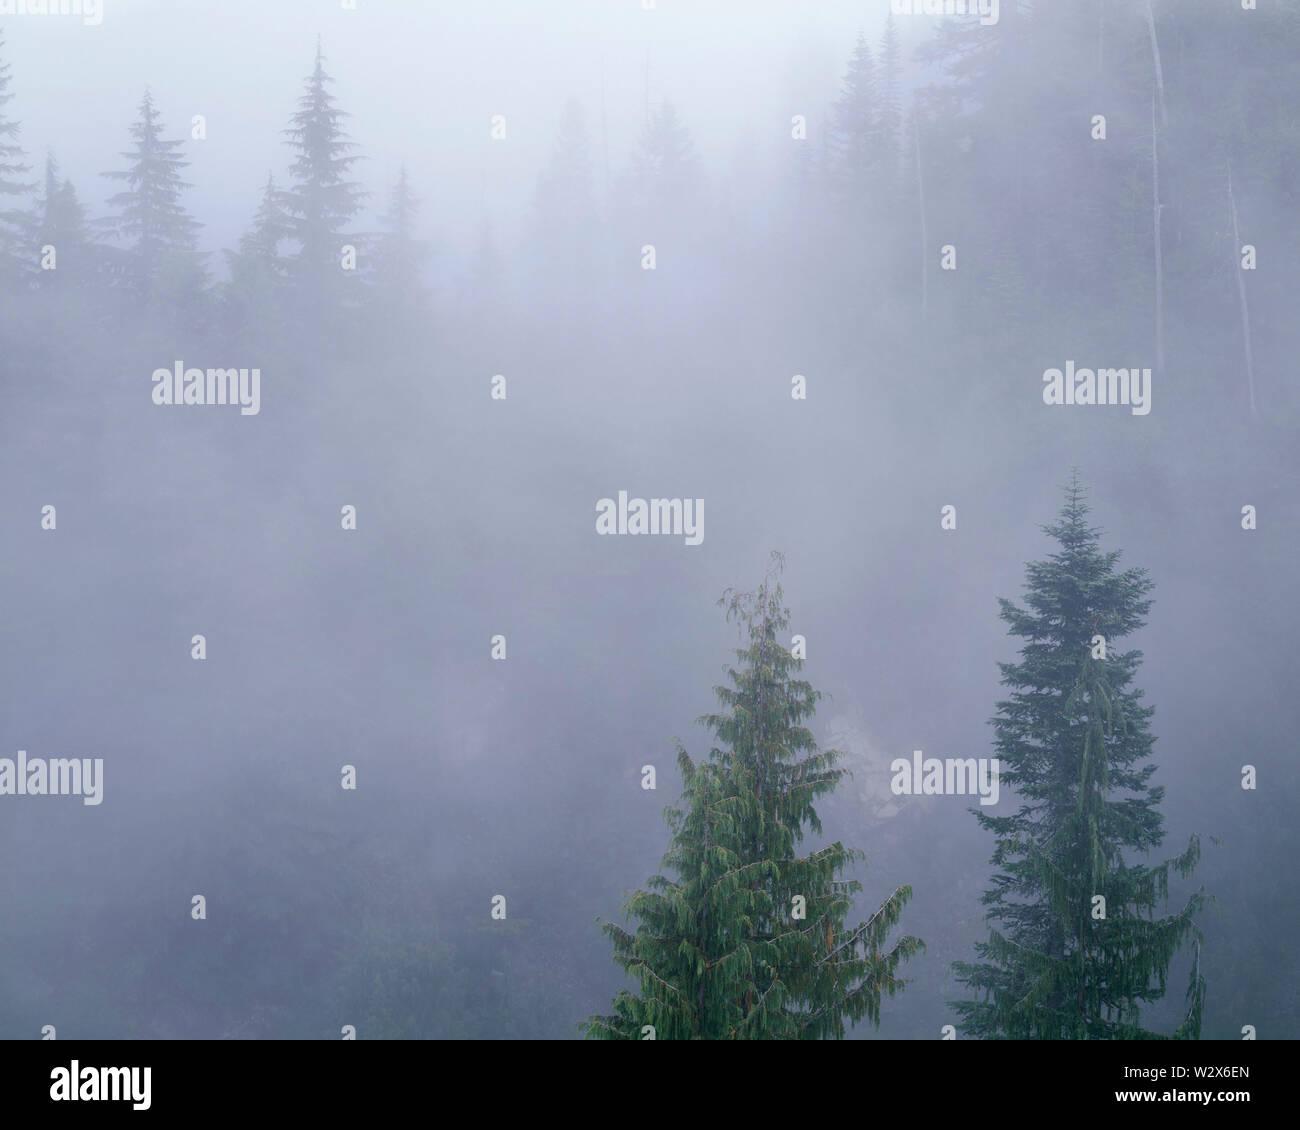 USA, Washington, Mt. Rainier National Park, Alaska yellow cedar and noble fir in fog at Stevens Canyon. - Stock Image